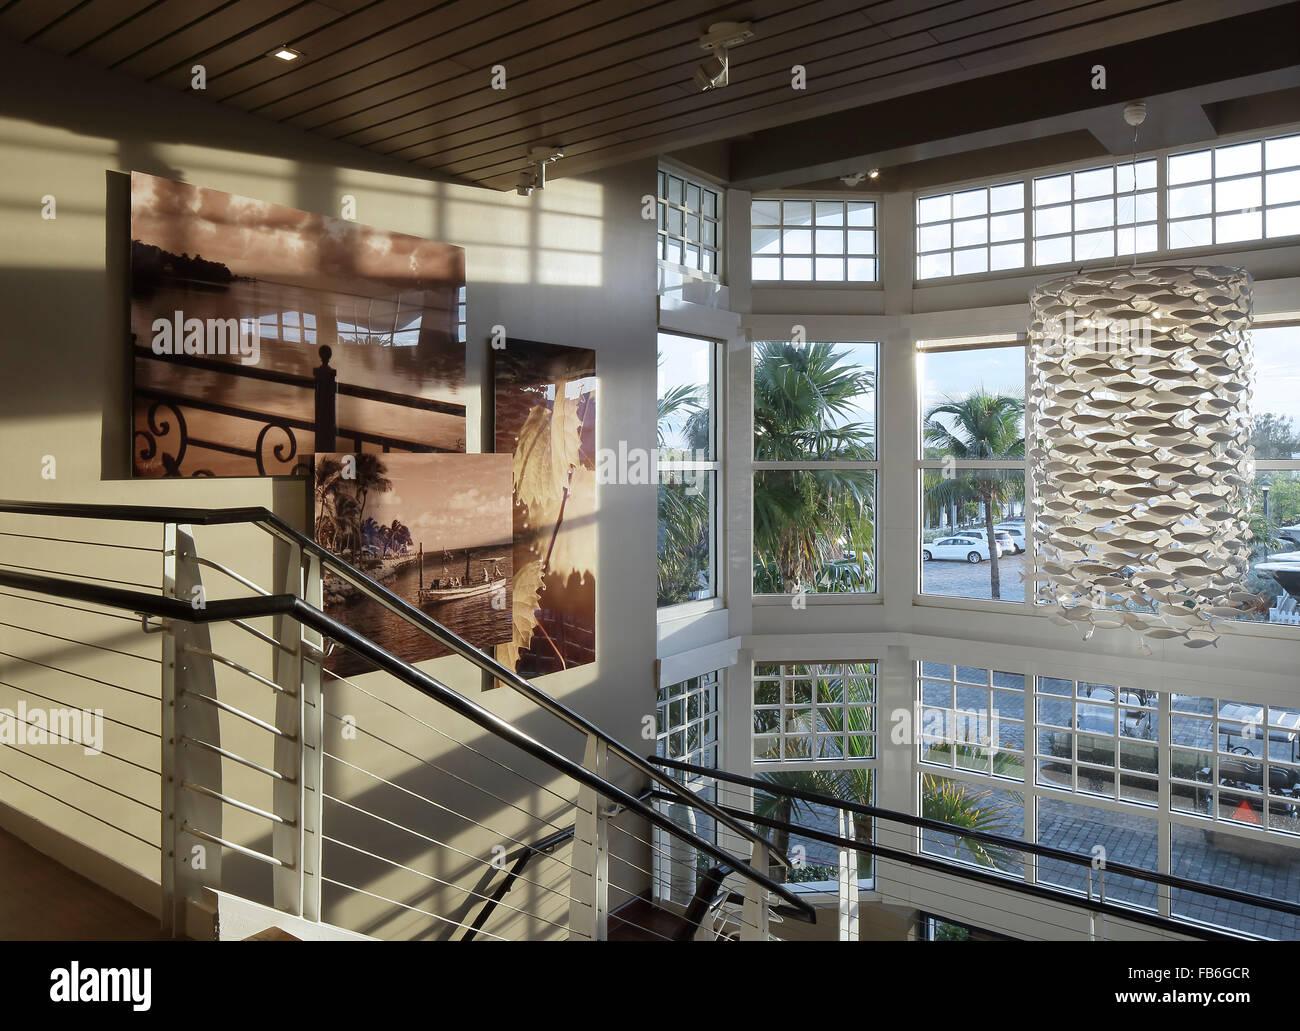 Interior view of Shoal by Scabetti Gianni Ristorante Key Largo